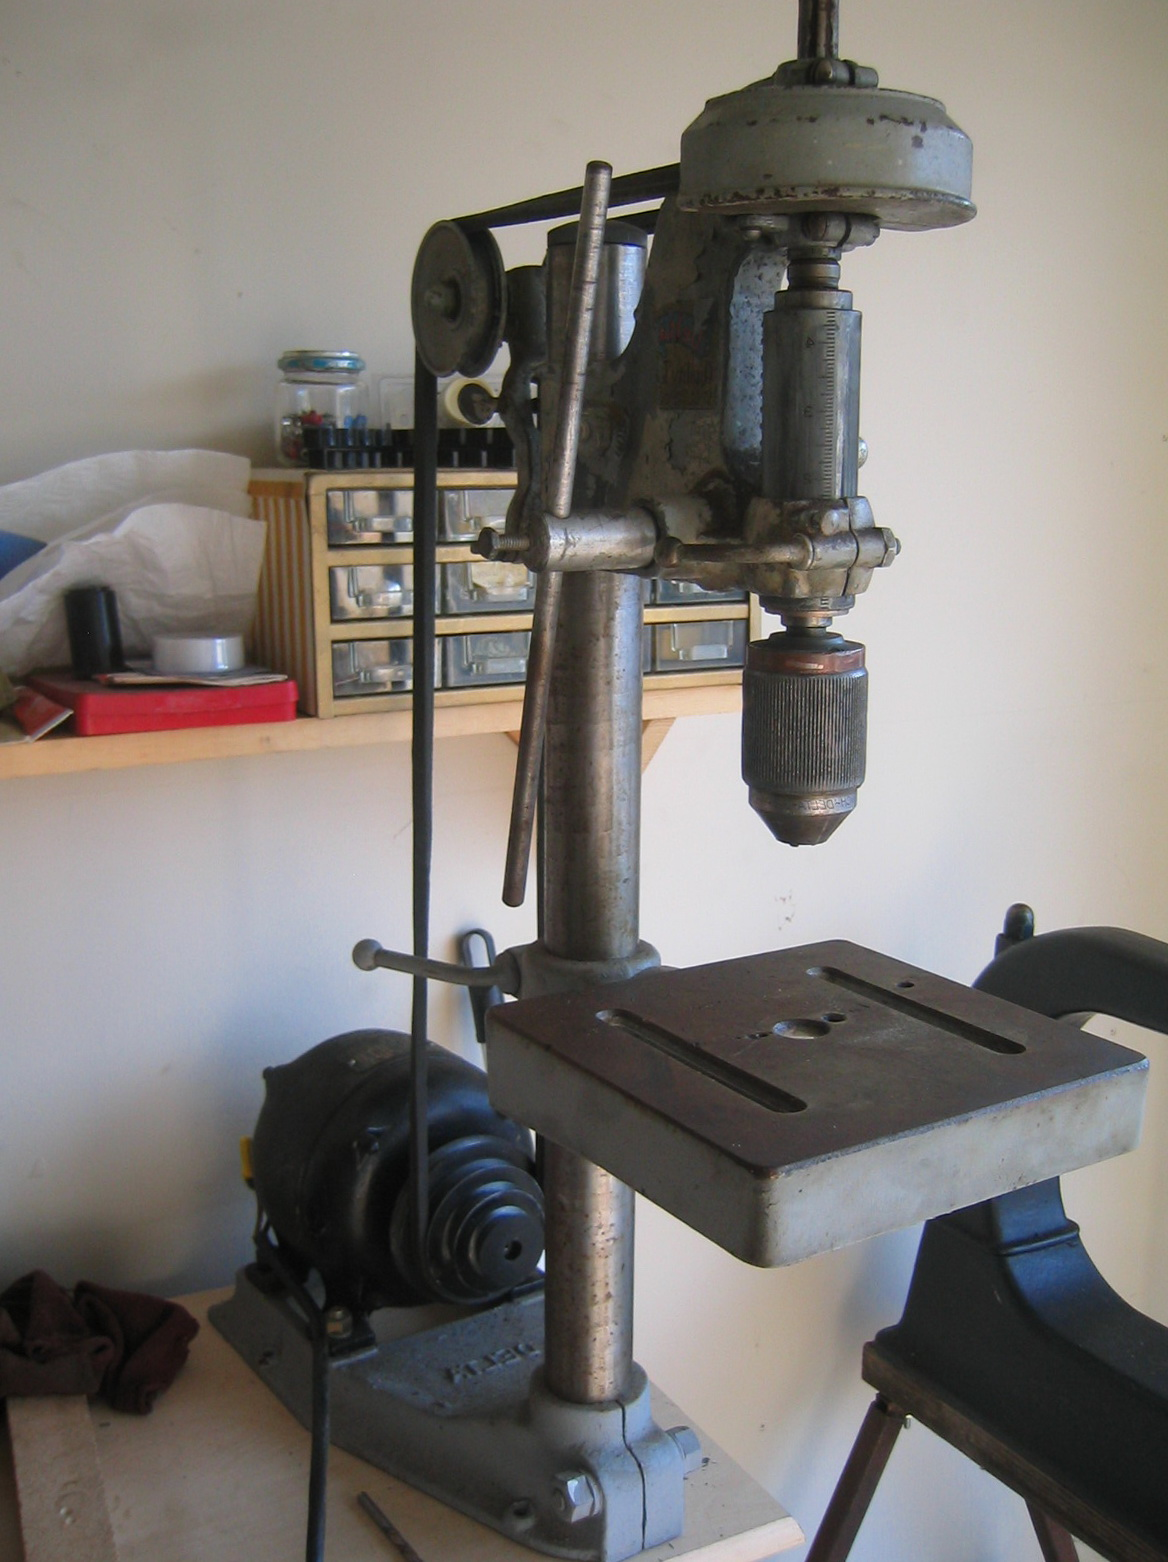 Craftsman Benchtop Drill Press